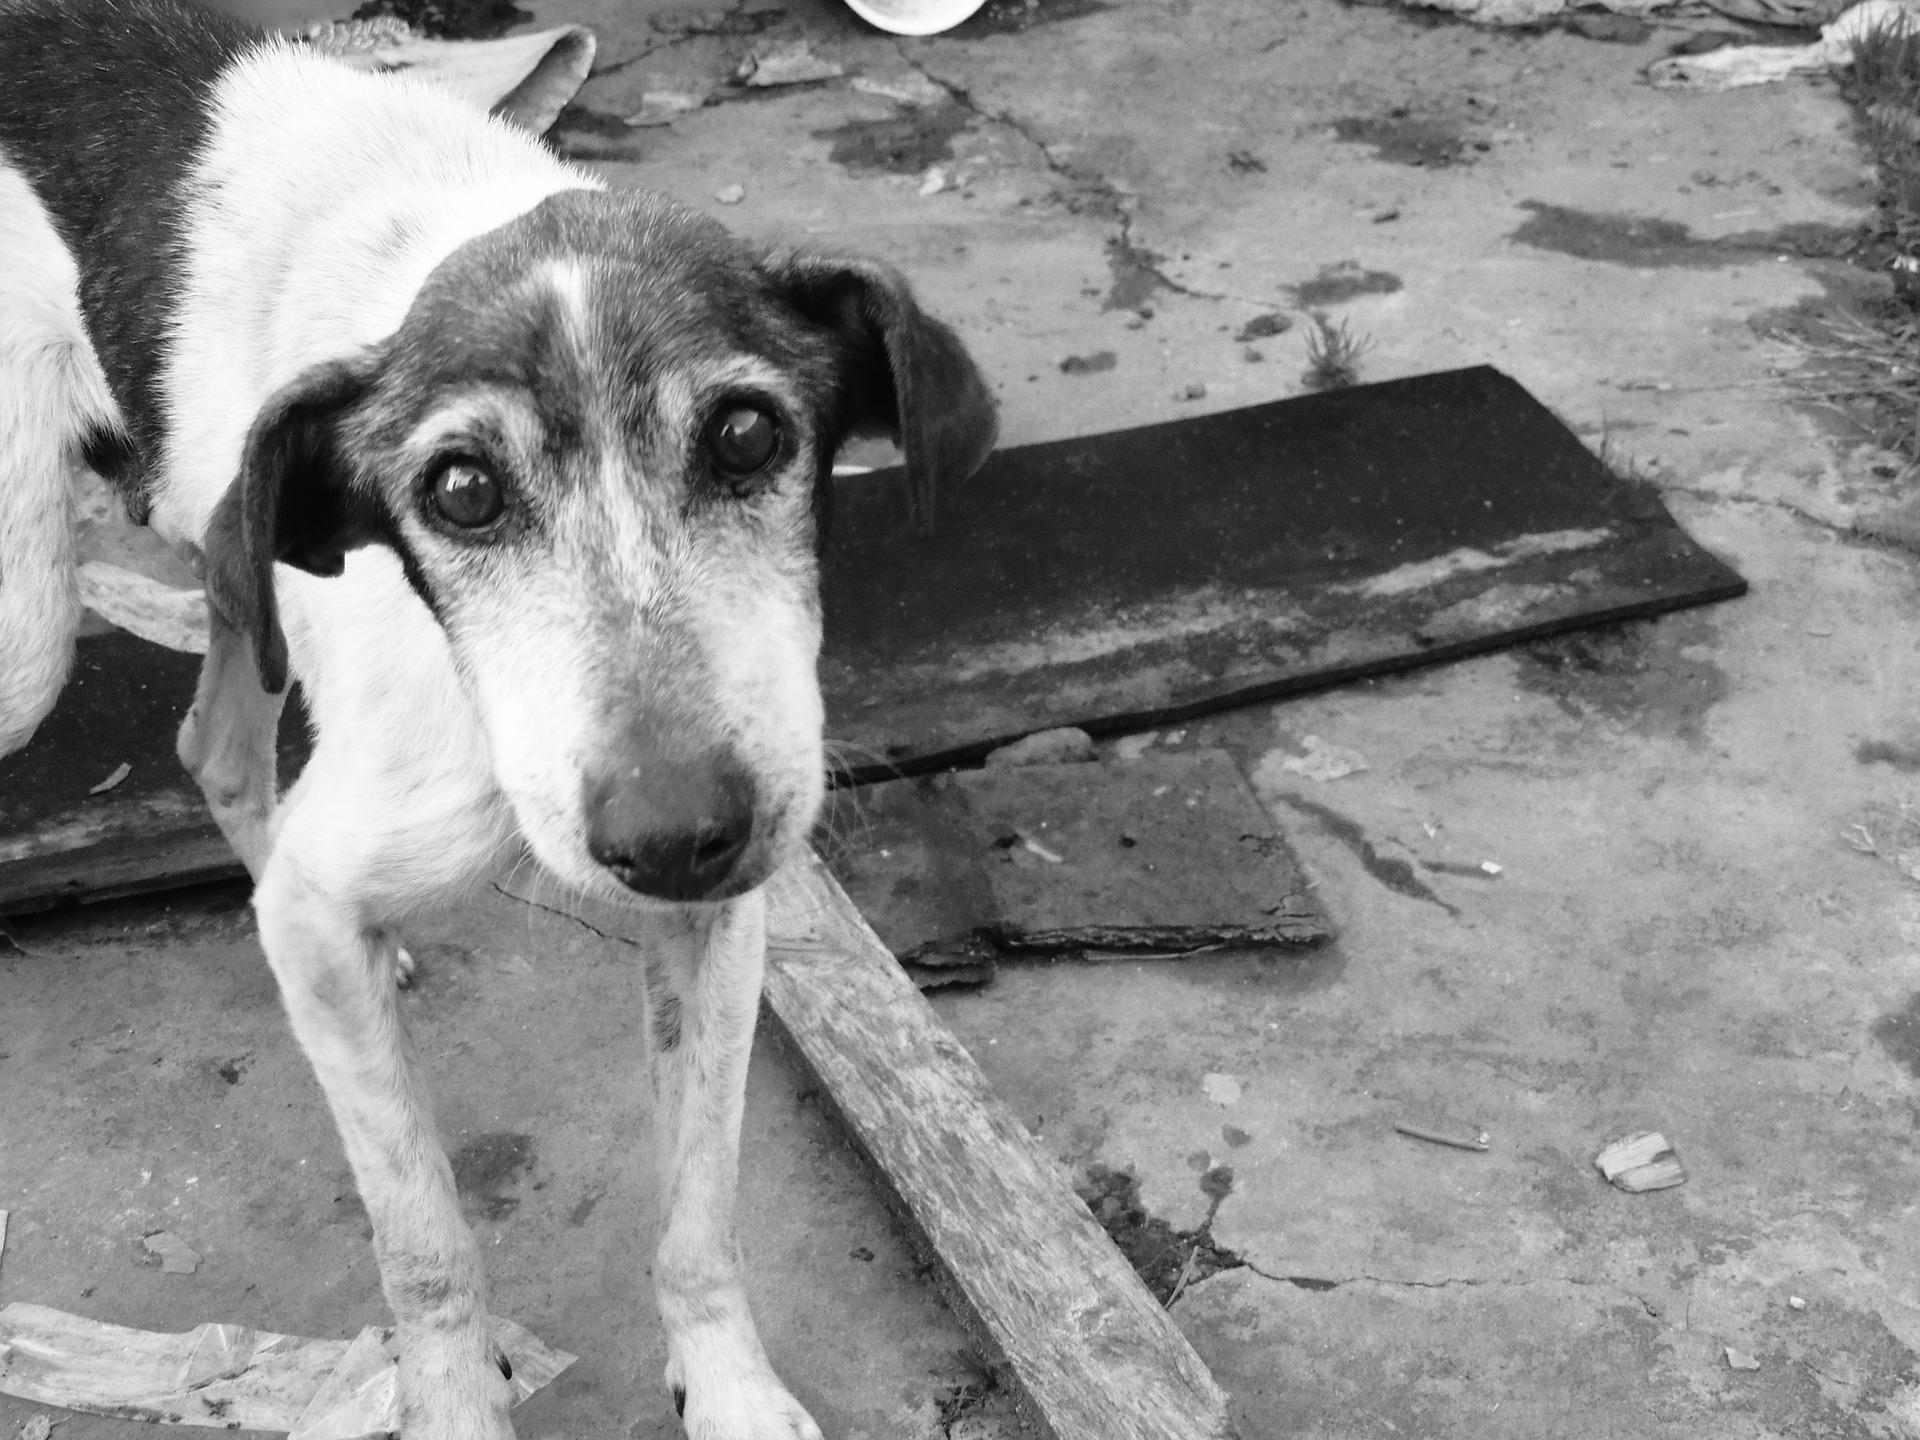 dog-1533715_1920.jpg